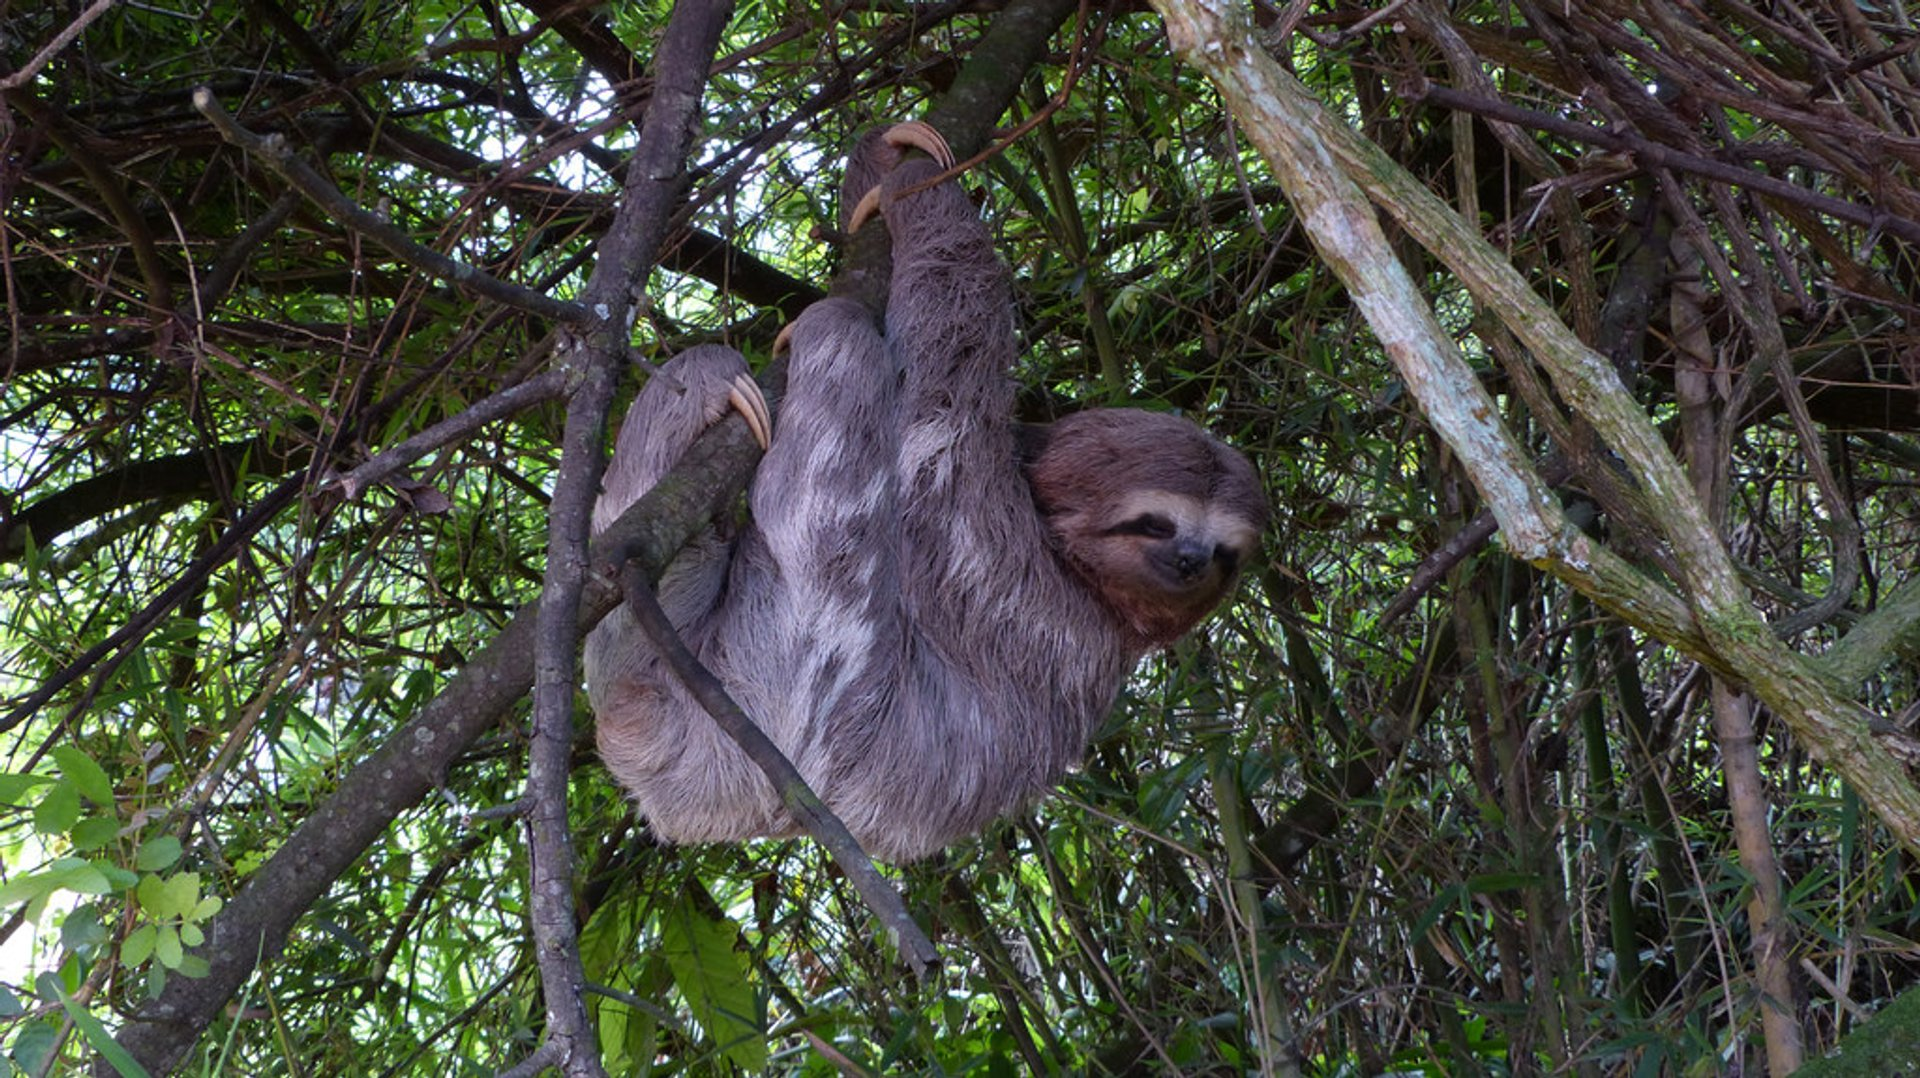 Three-Toed Sloth Mating Season in Rio de Janeiro - Best Season 2020